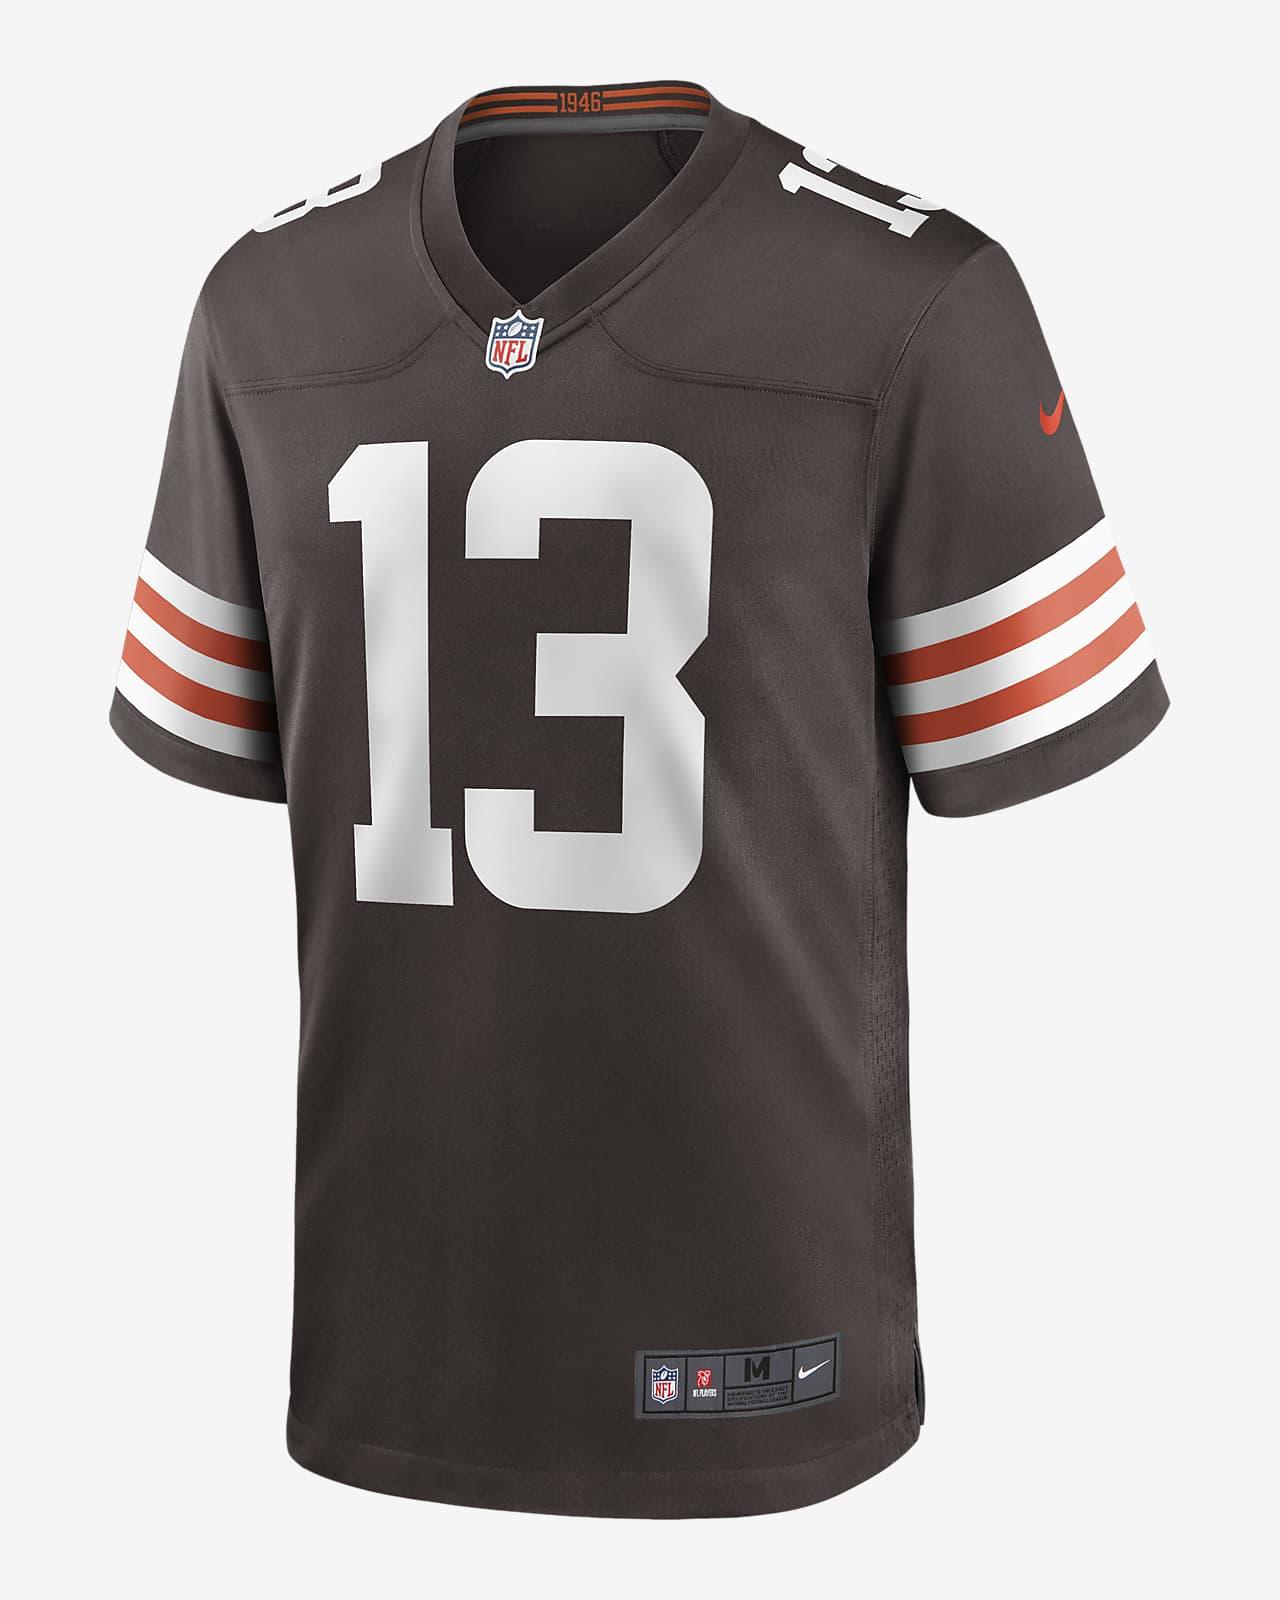 NFL Cleveland Browns (Odell Beckham) Men's Game Football Jersey